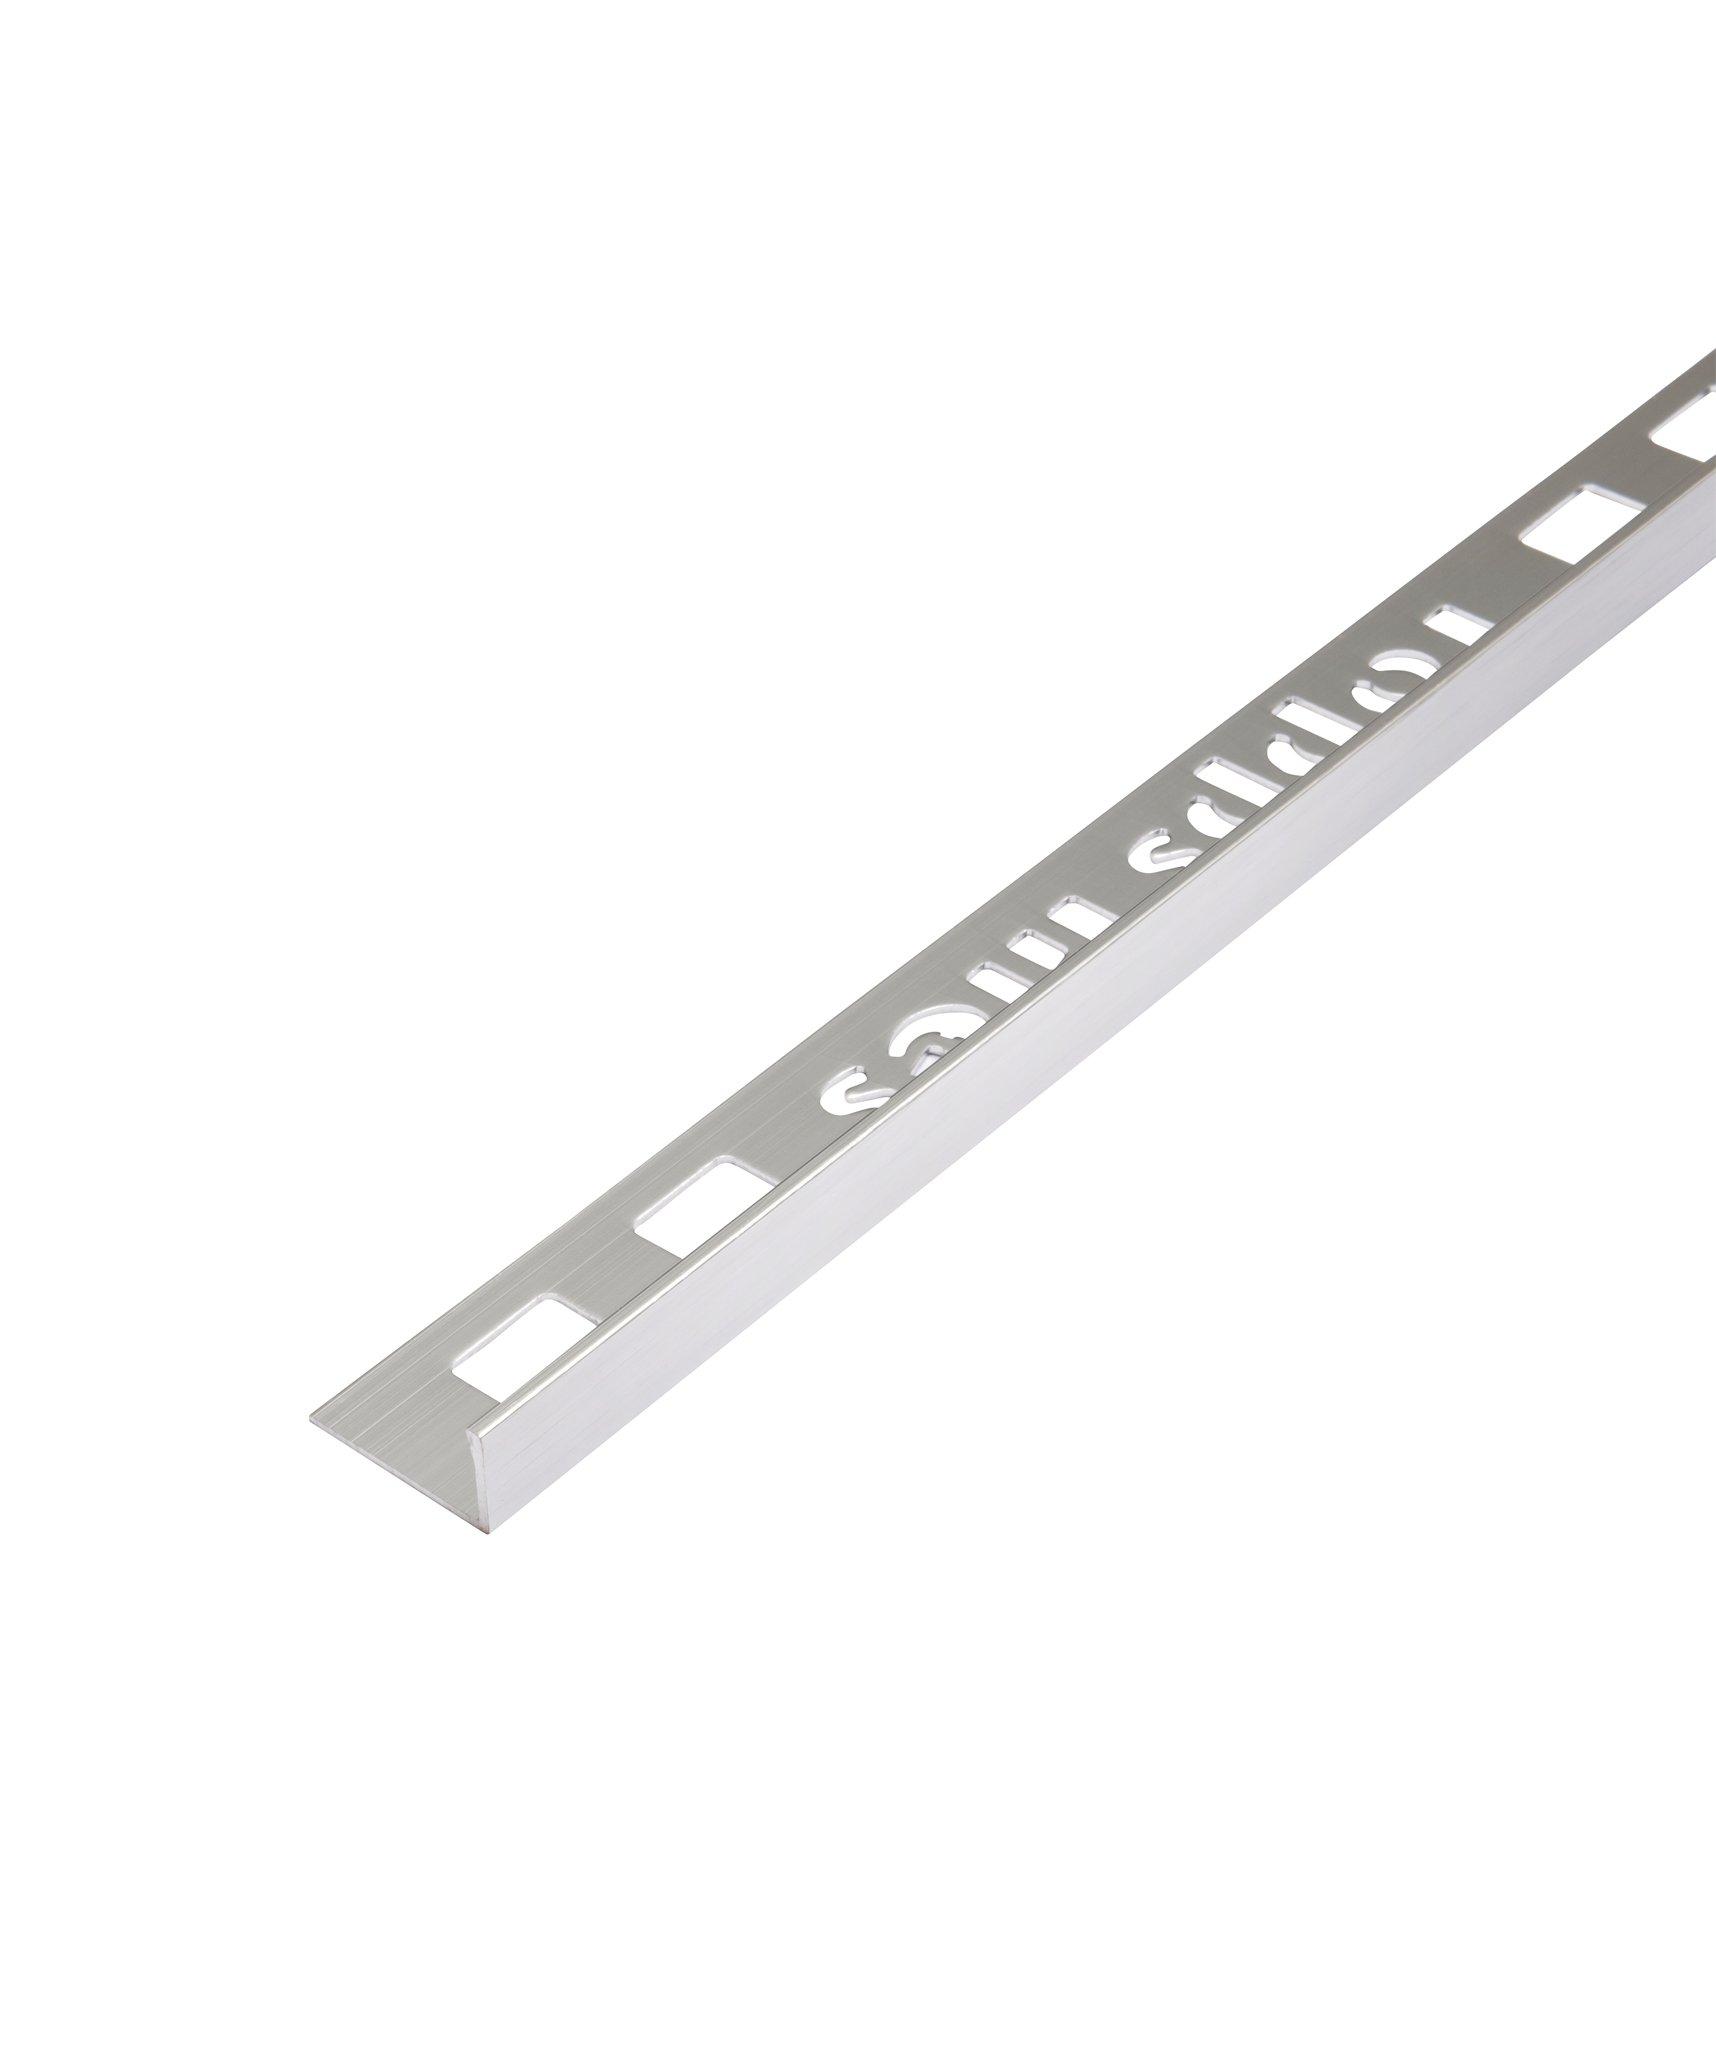 topps tiles 8mm stainless steel effect straight edge trim